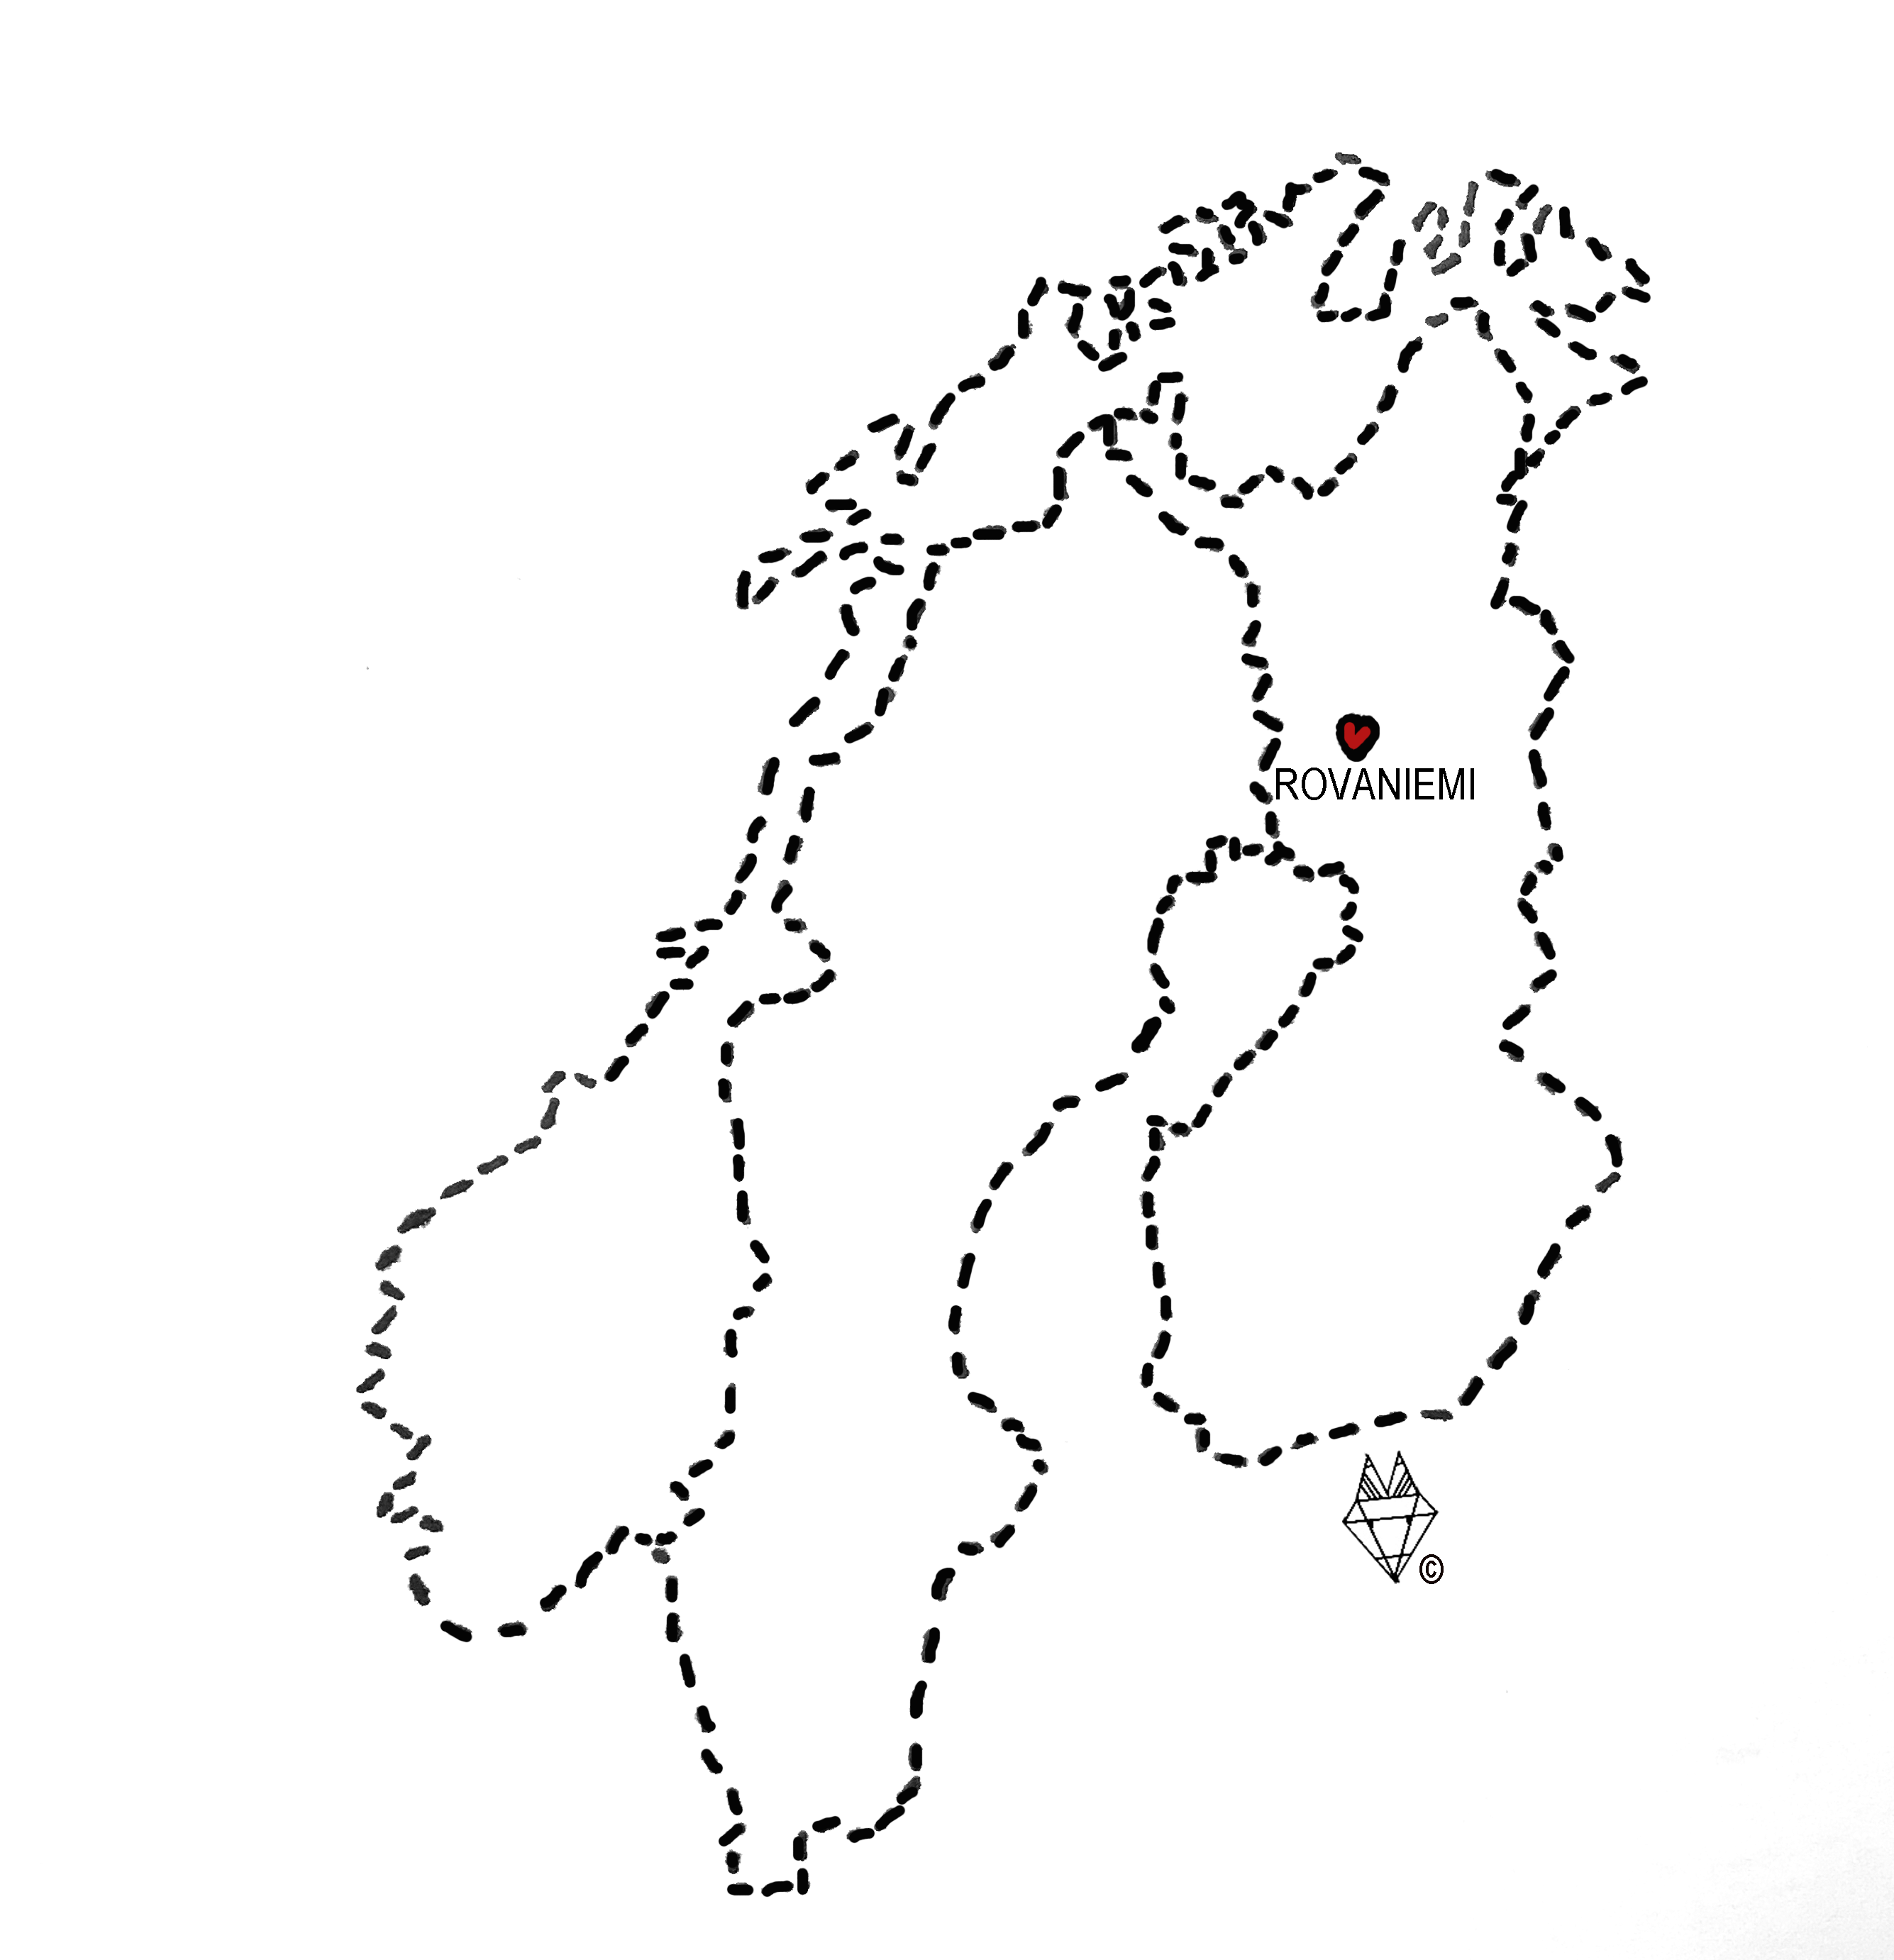 finnland-map-rovaniemi-theo